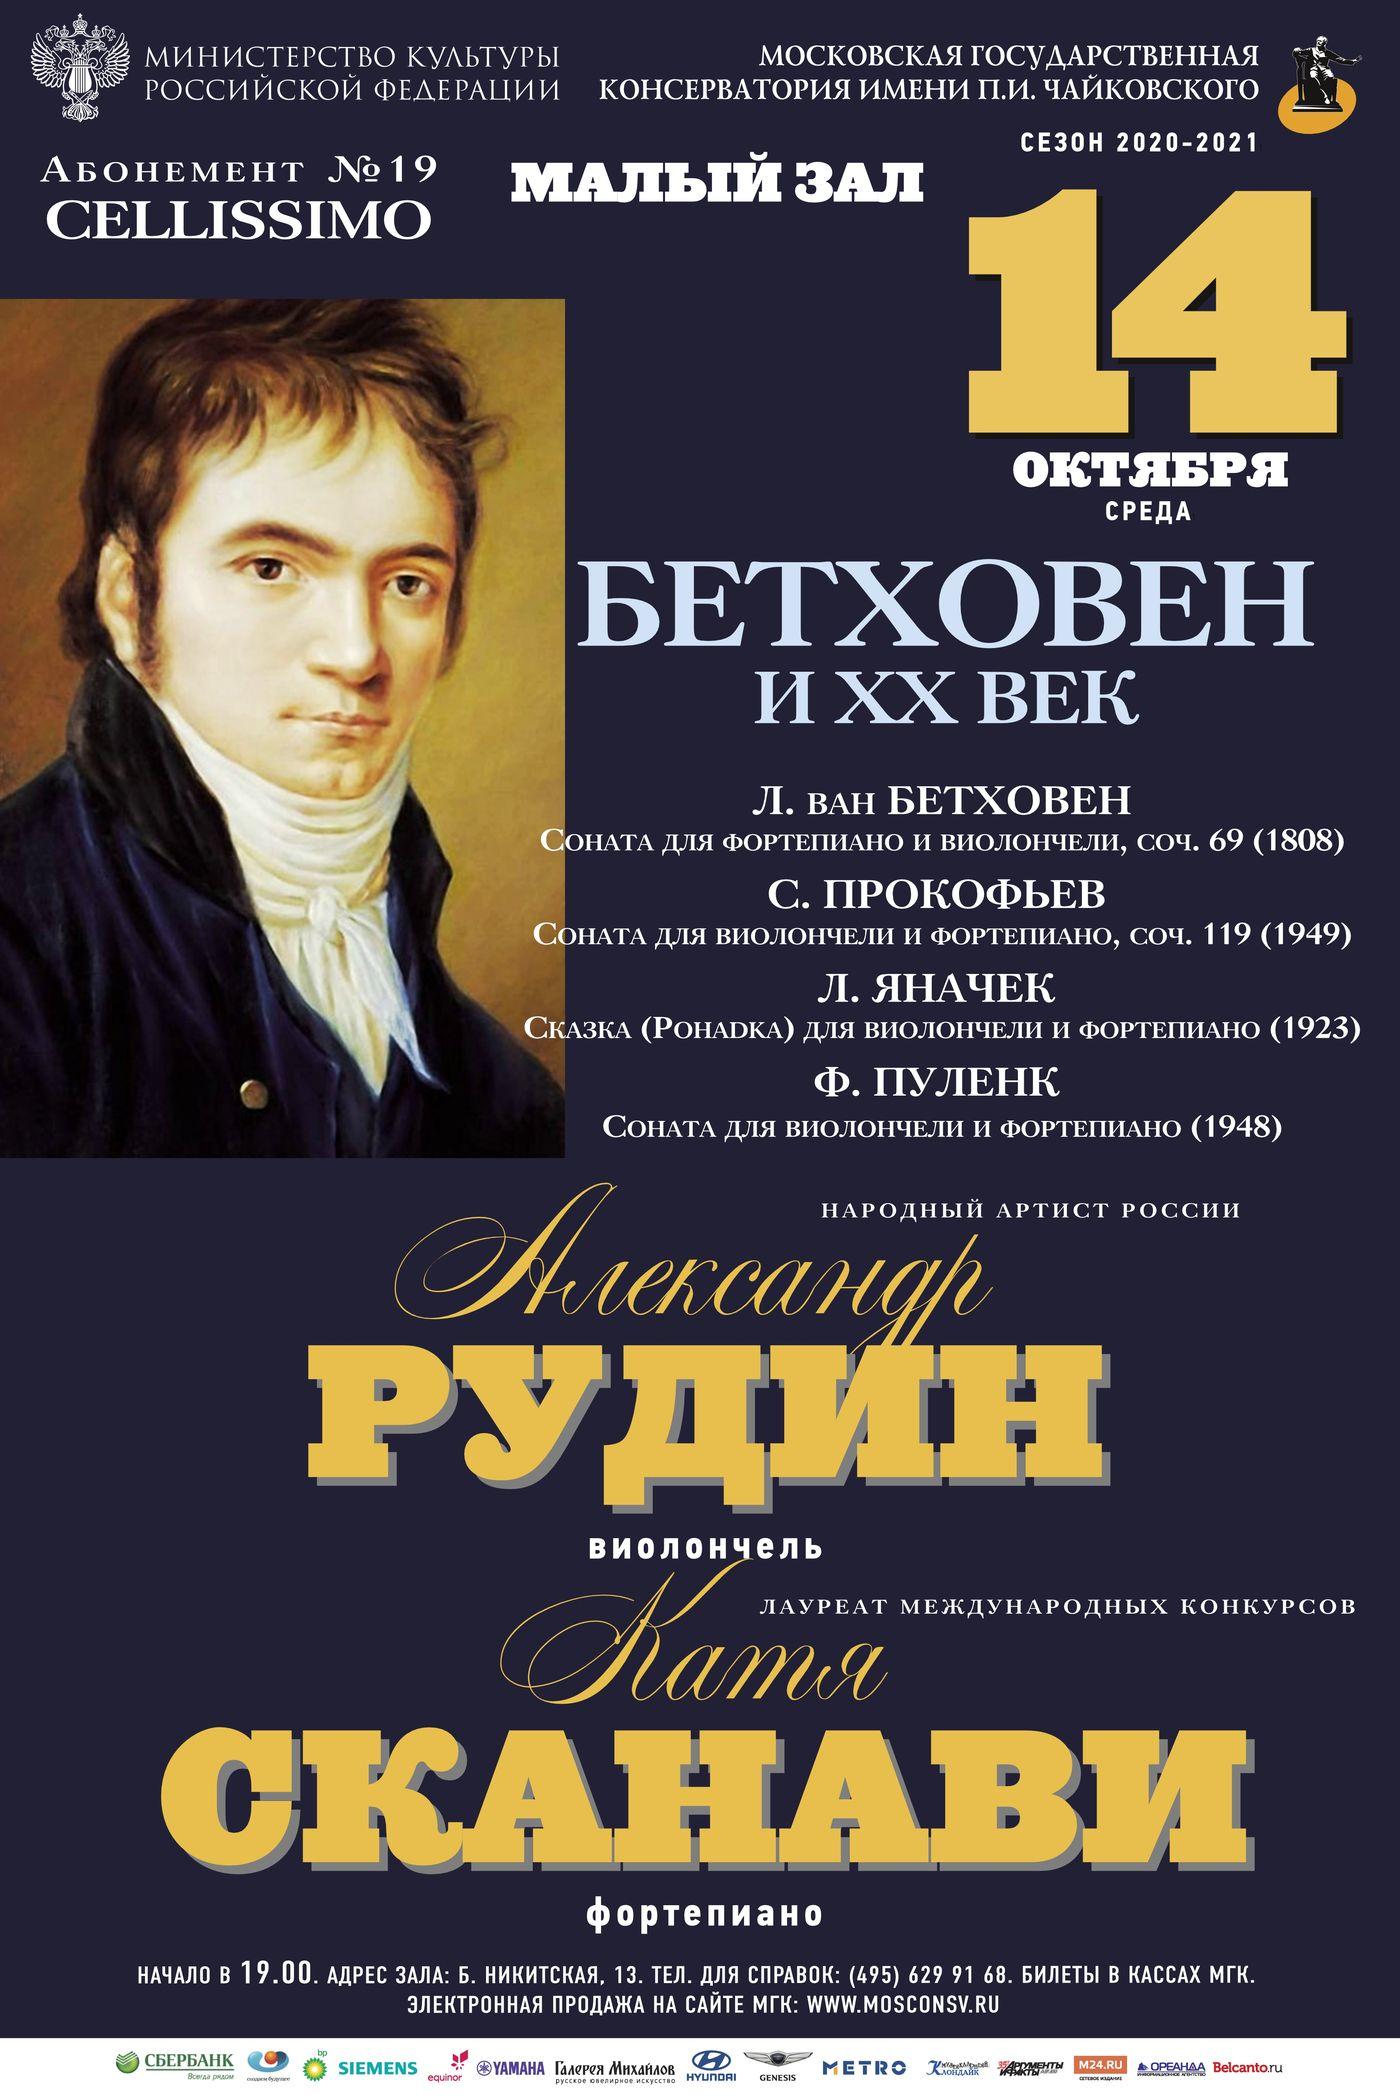 Александр Рудин. МЗК, 14.10.20